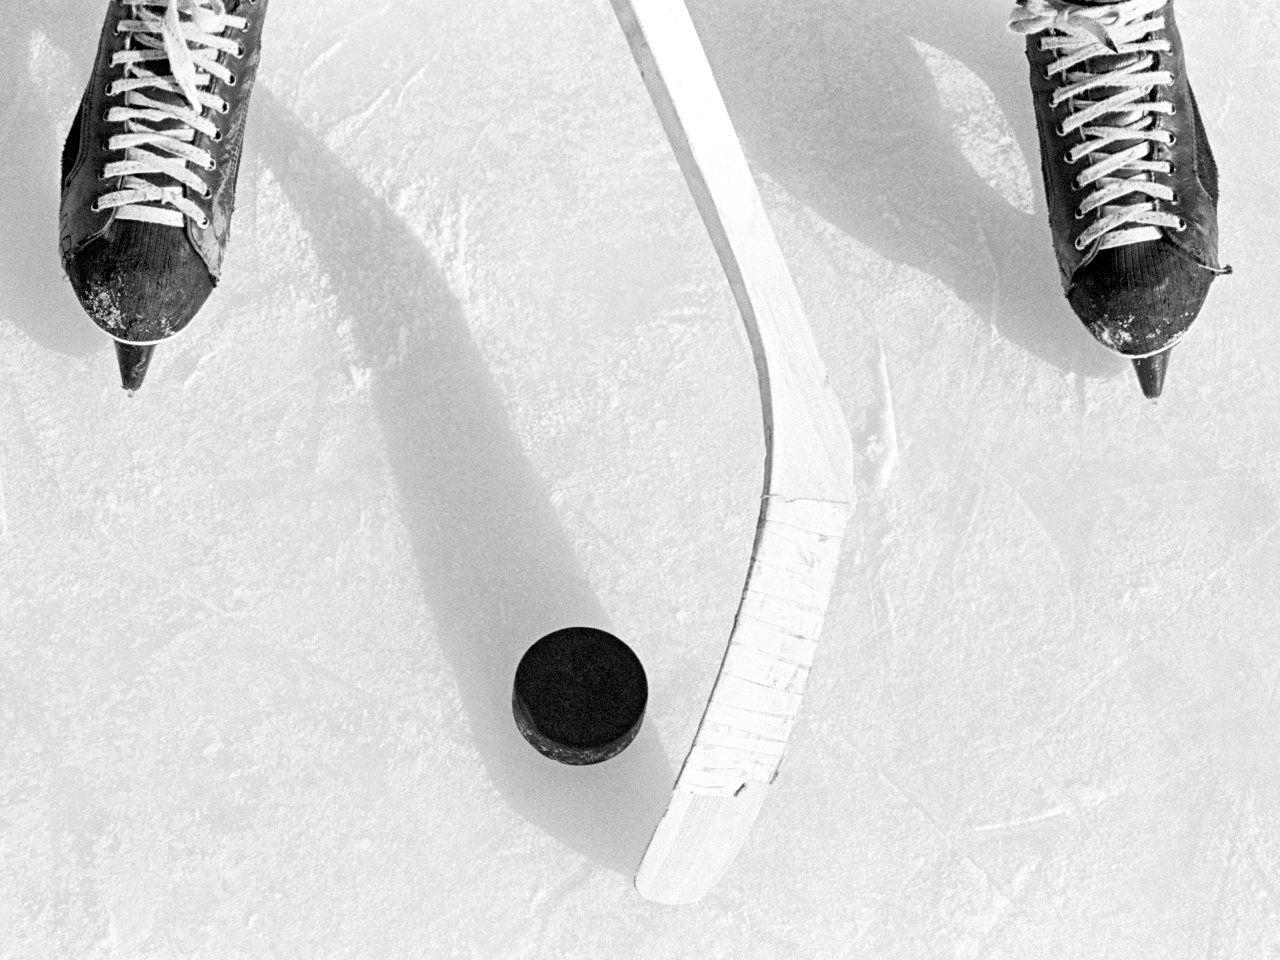 Hockey Ice hockey, Hockey, Elle kennedy